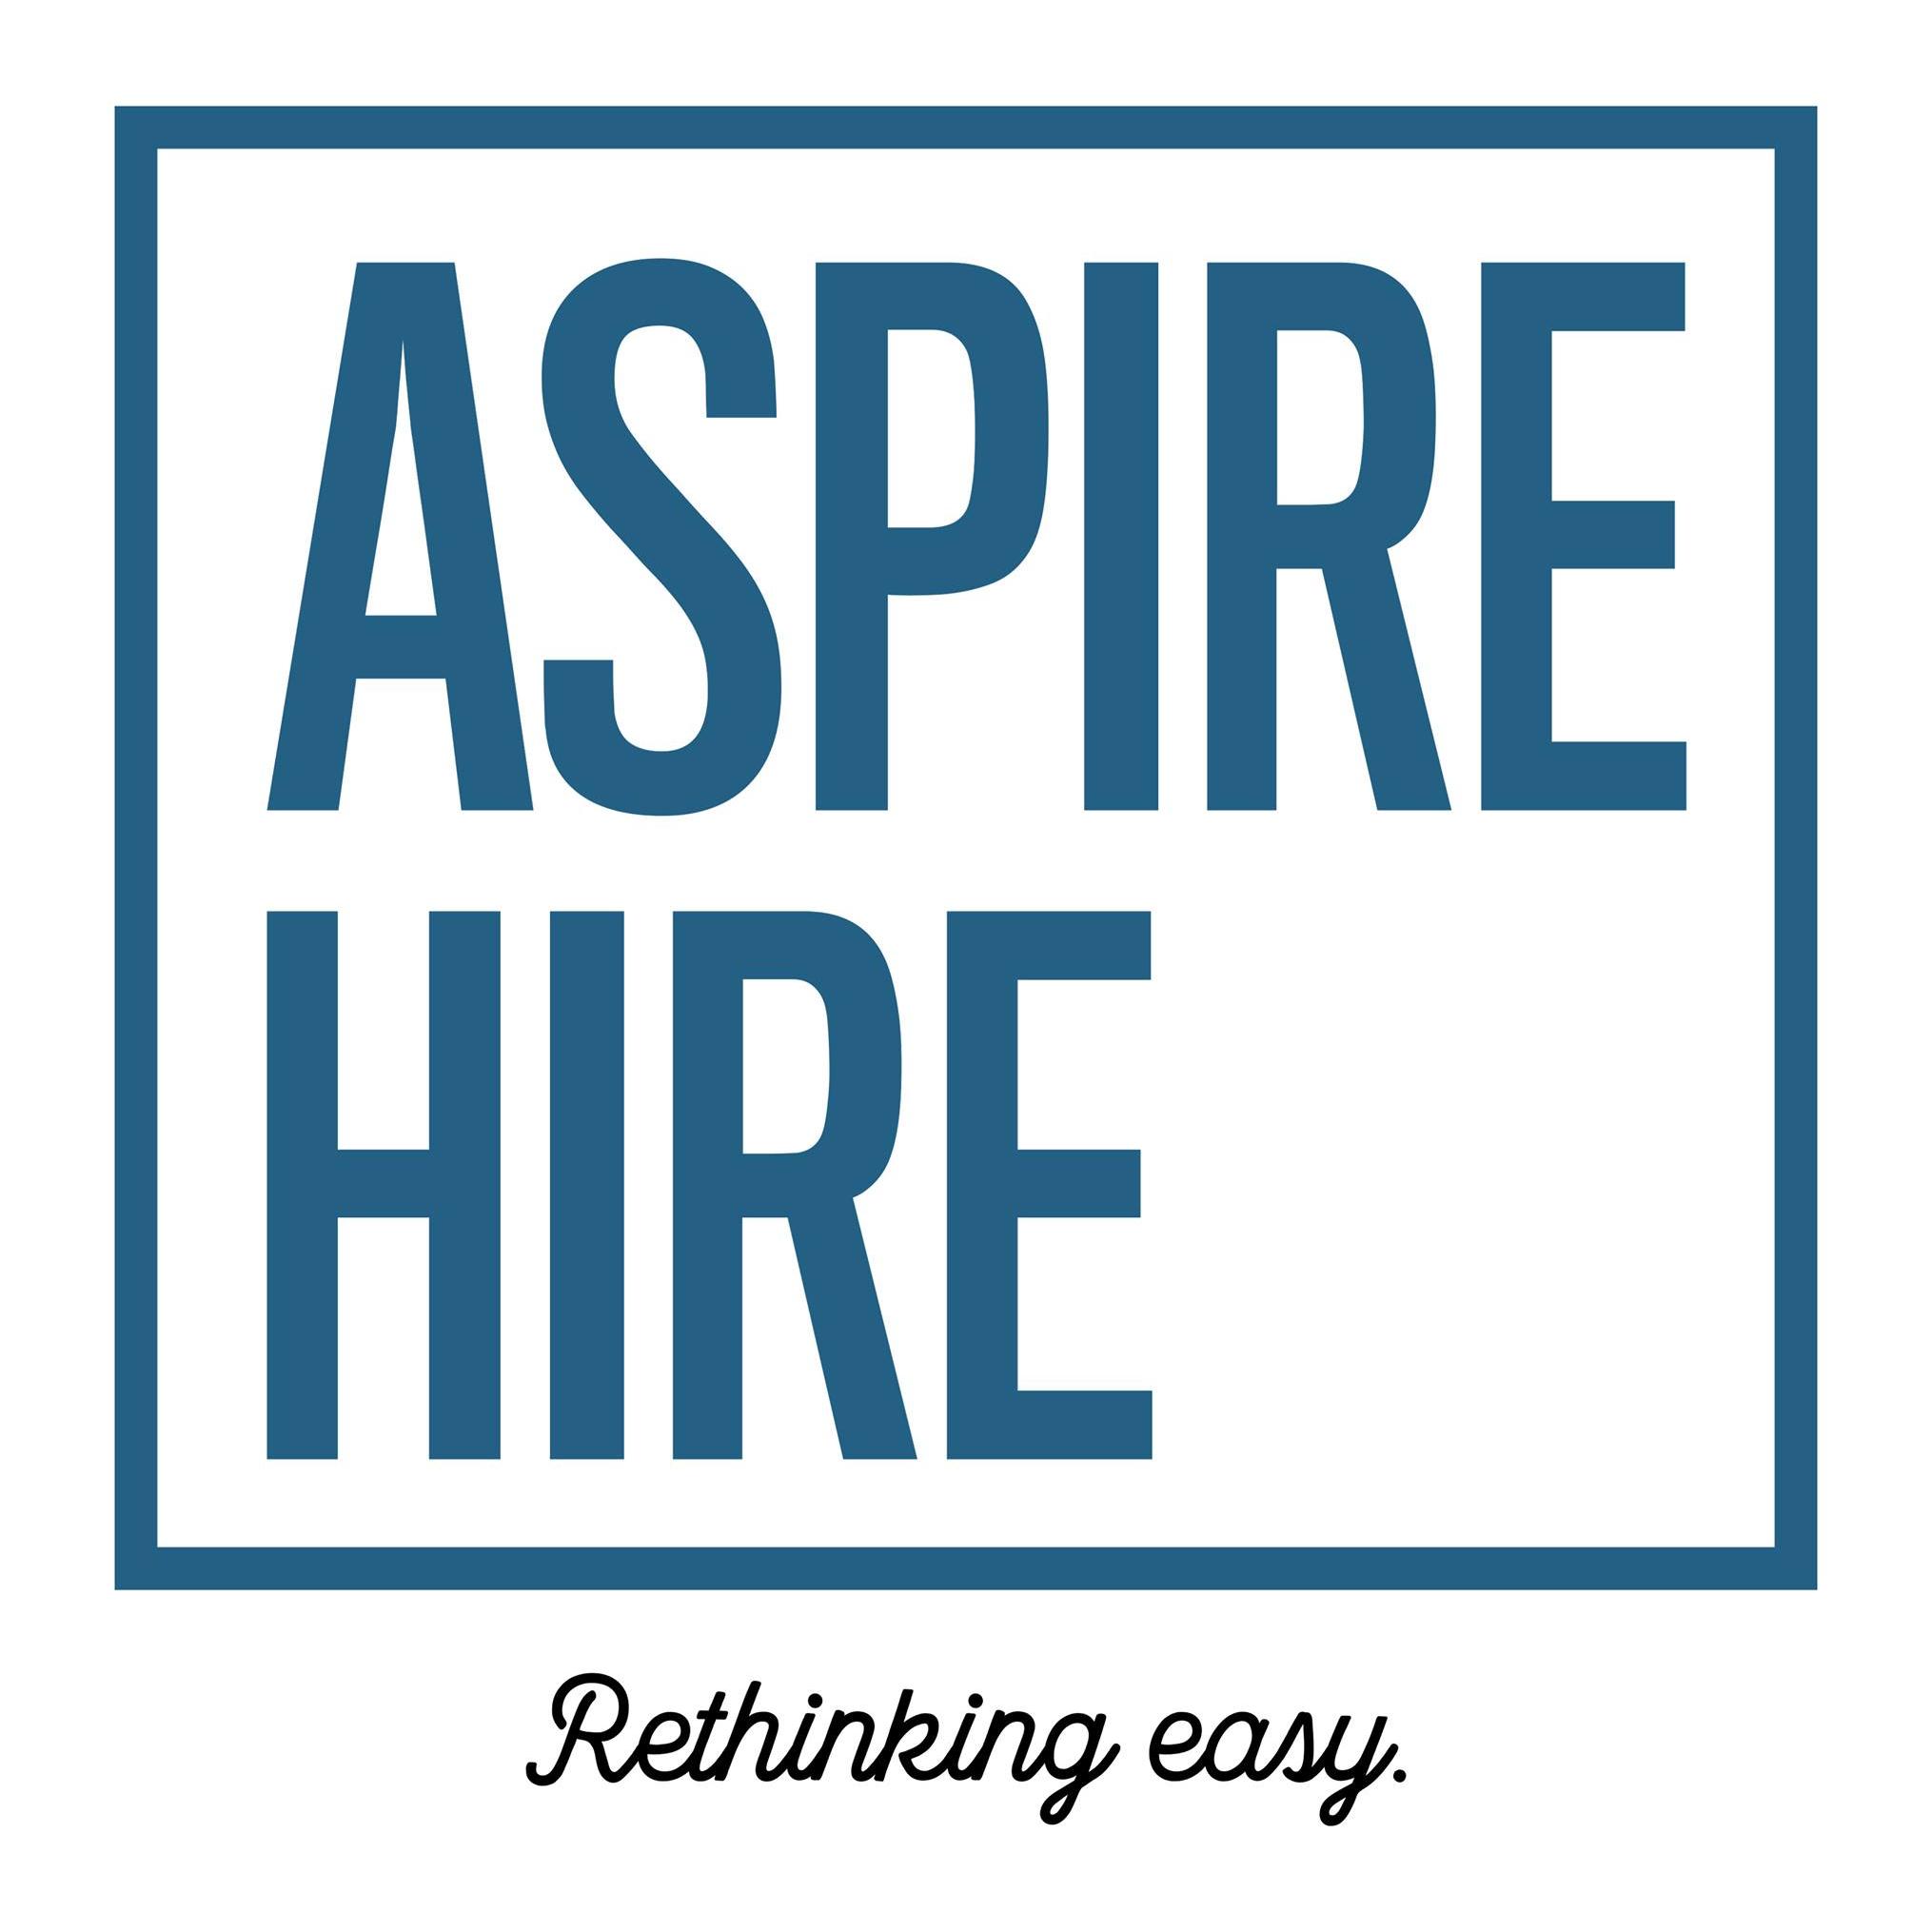 Aspire Equipment Hire